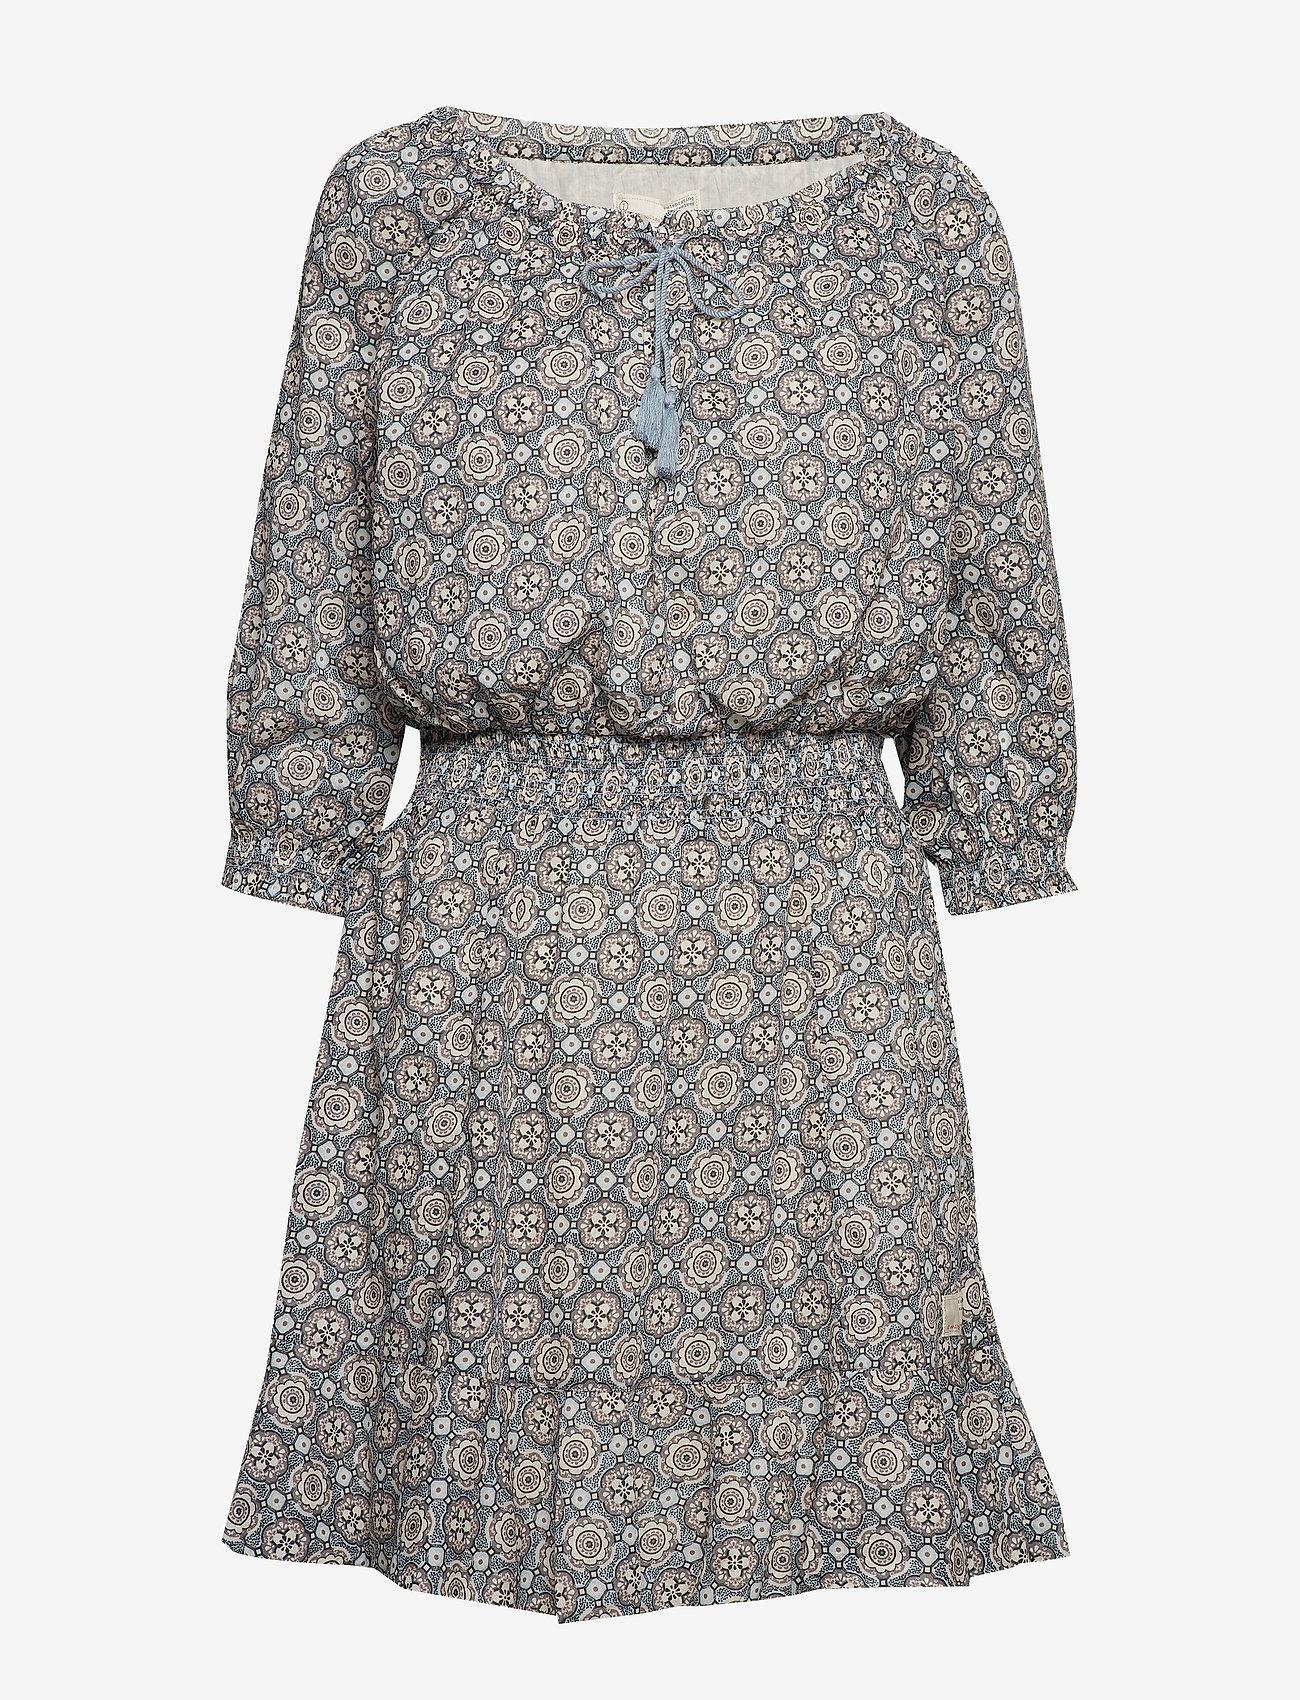 ODD MOLLY - stayin free dress - lyhyet mekot - misty blue